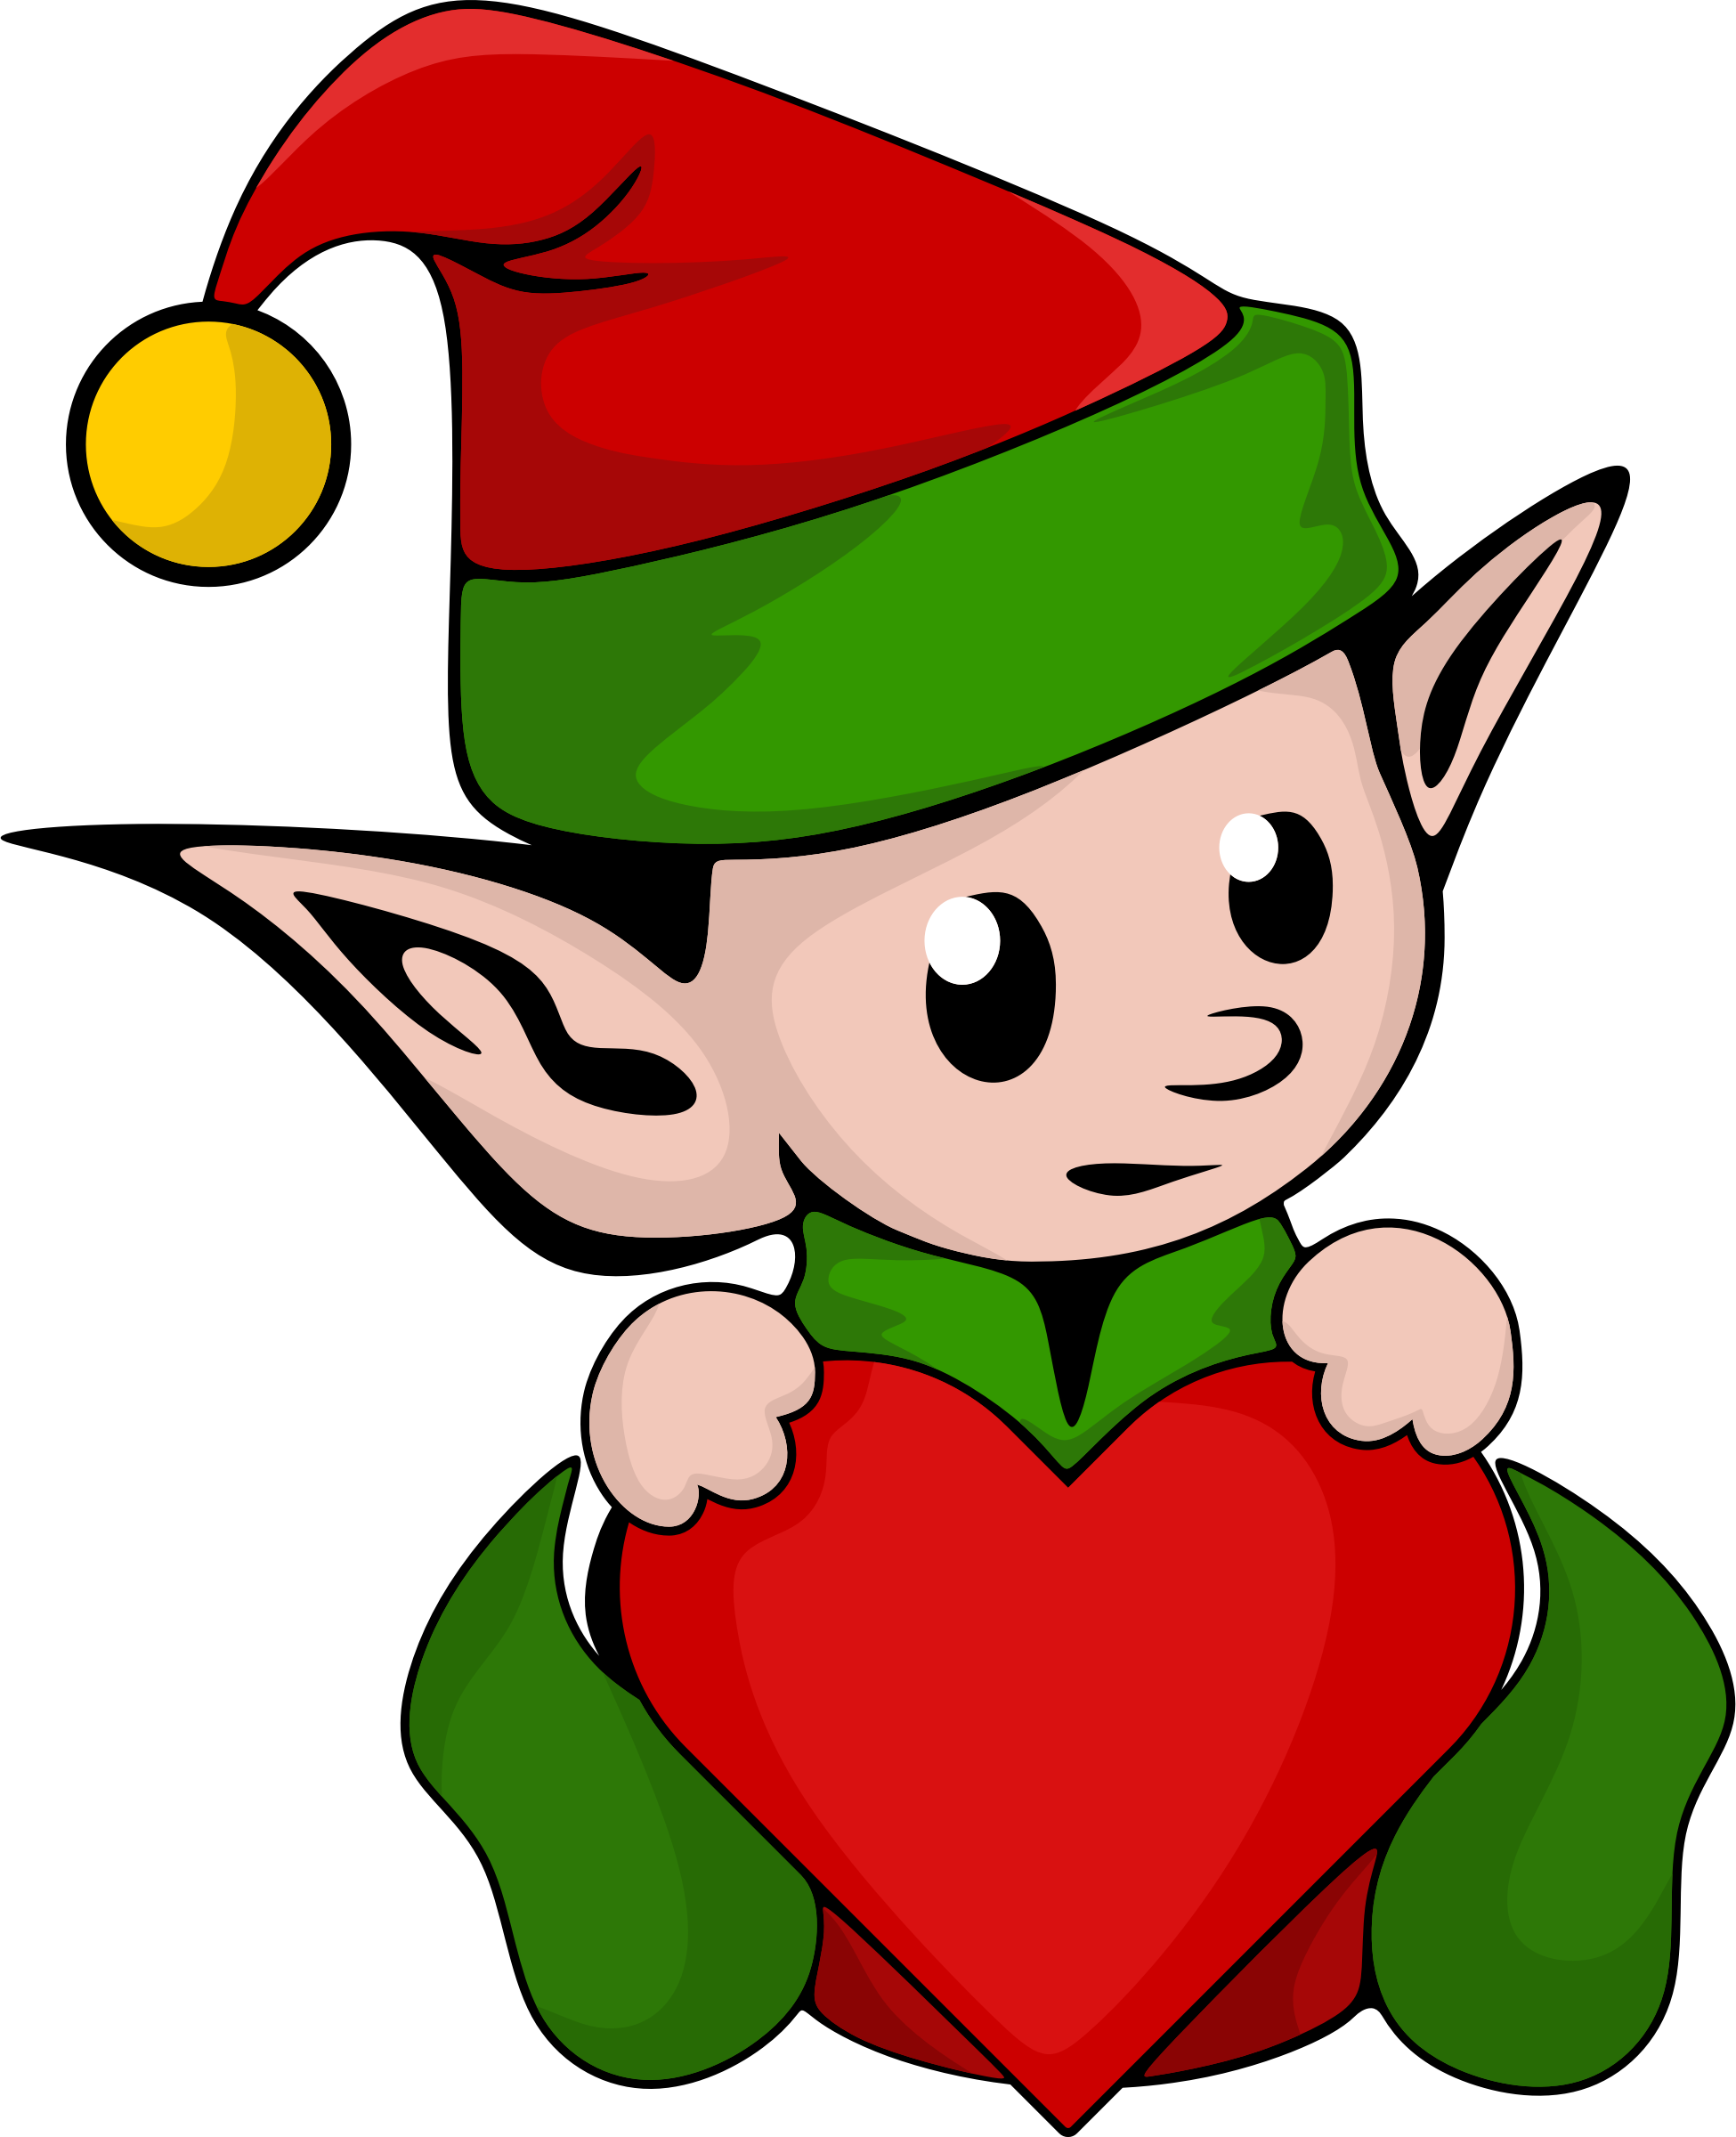 cute elf clipart at getdrawings com free for personal use cute elf rh getdrawings com free elf clipart pictures free elf clipart pictures